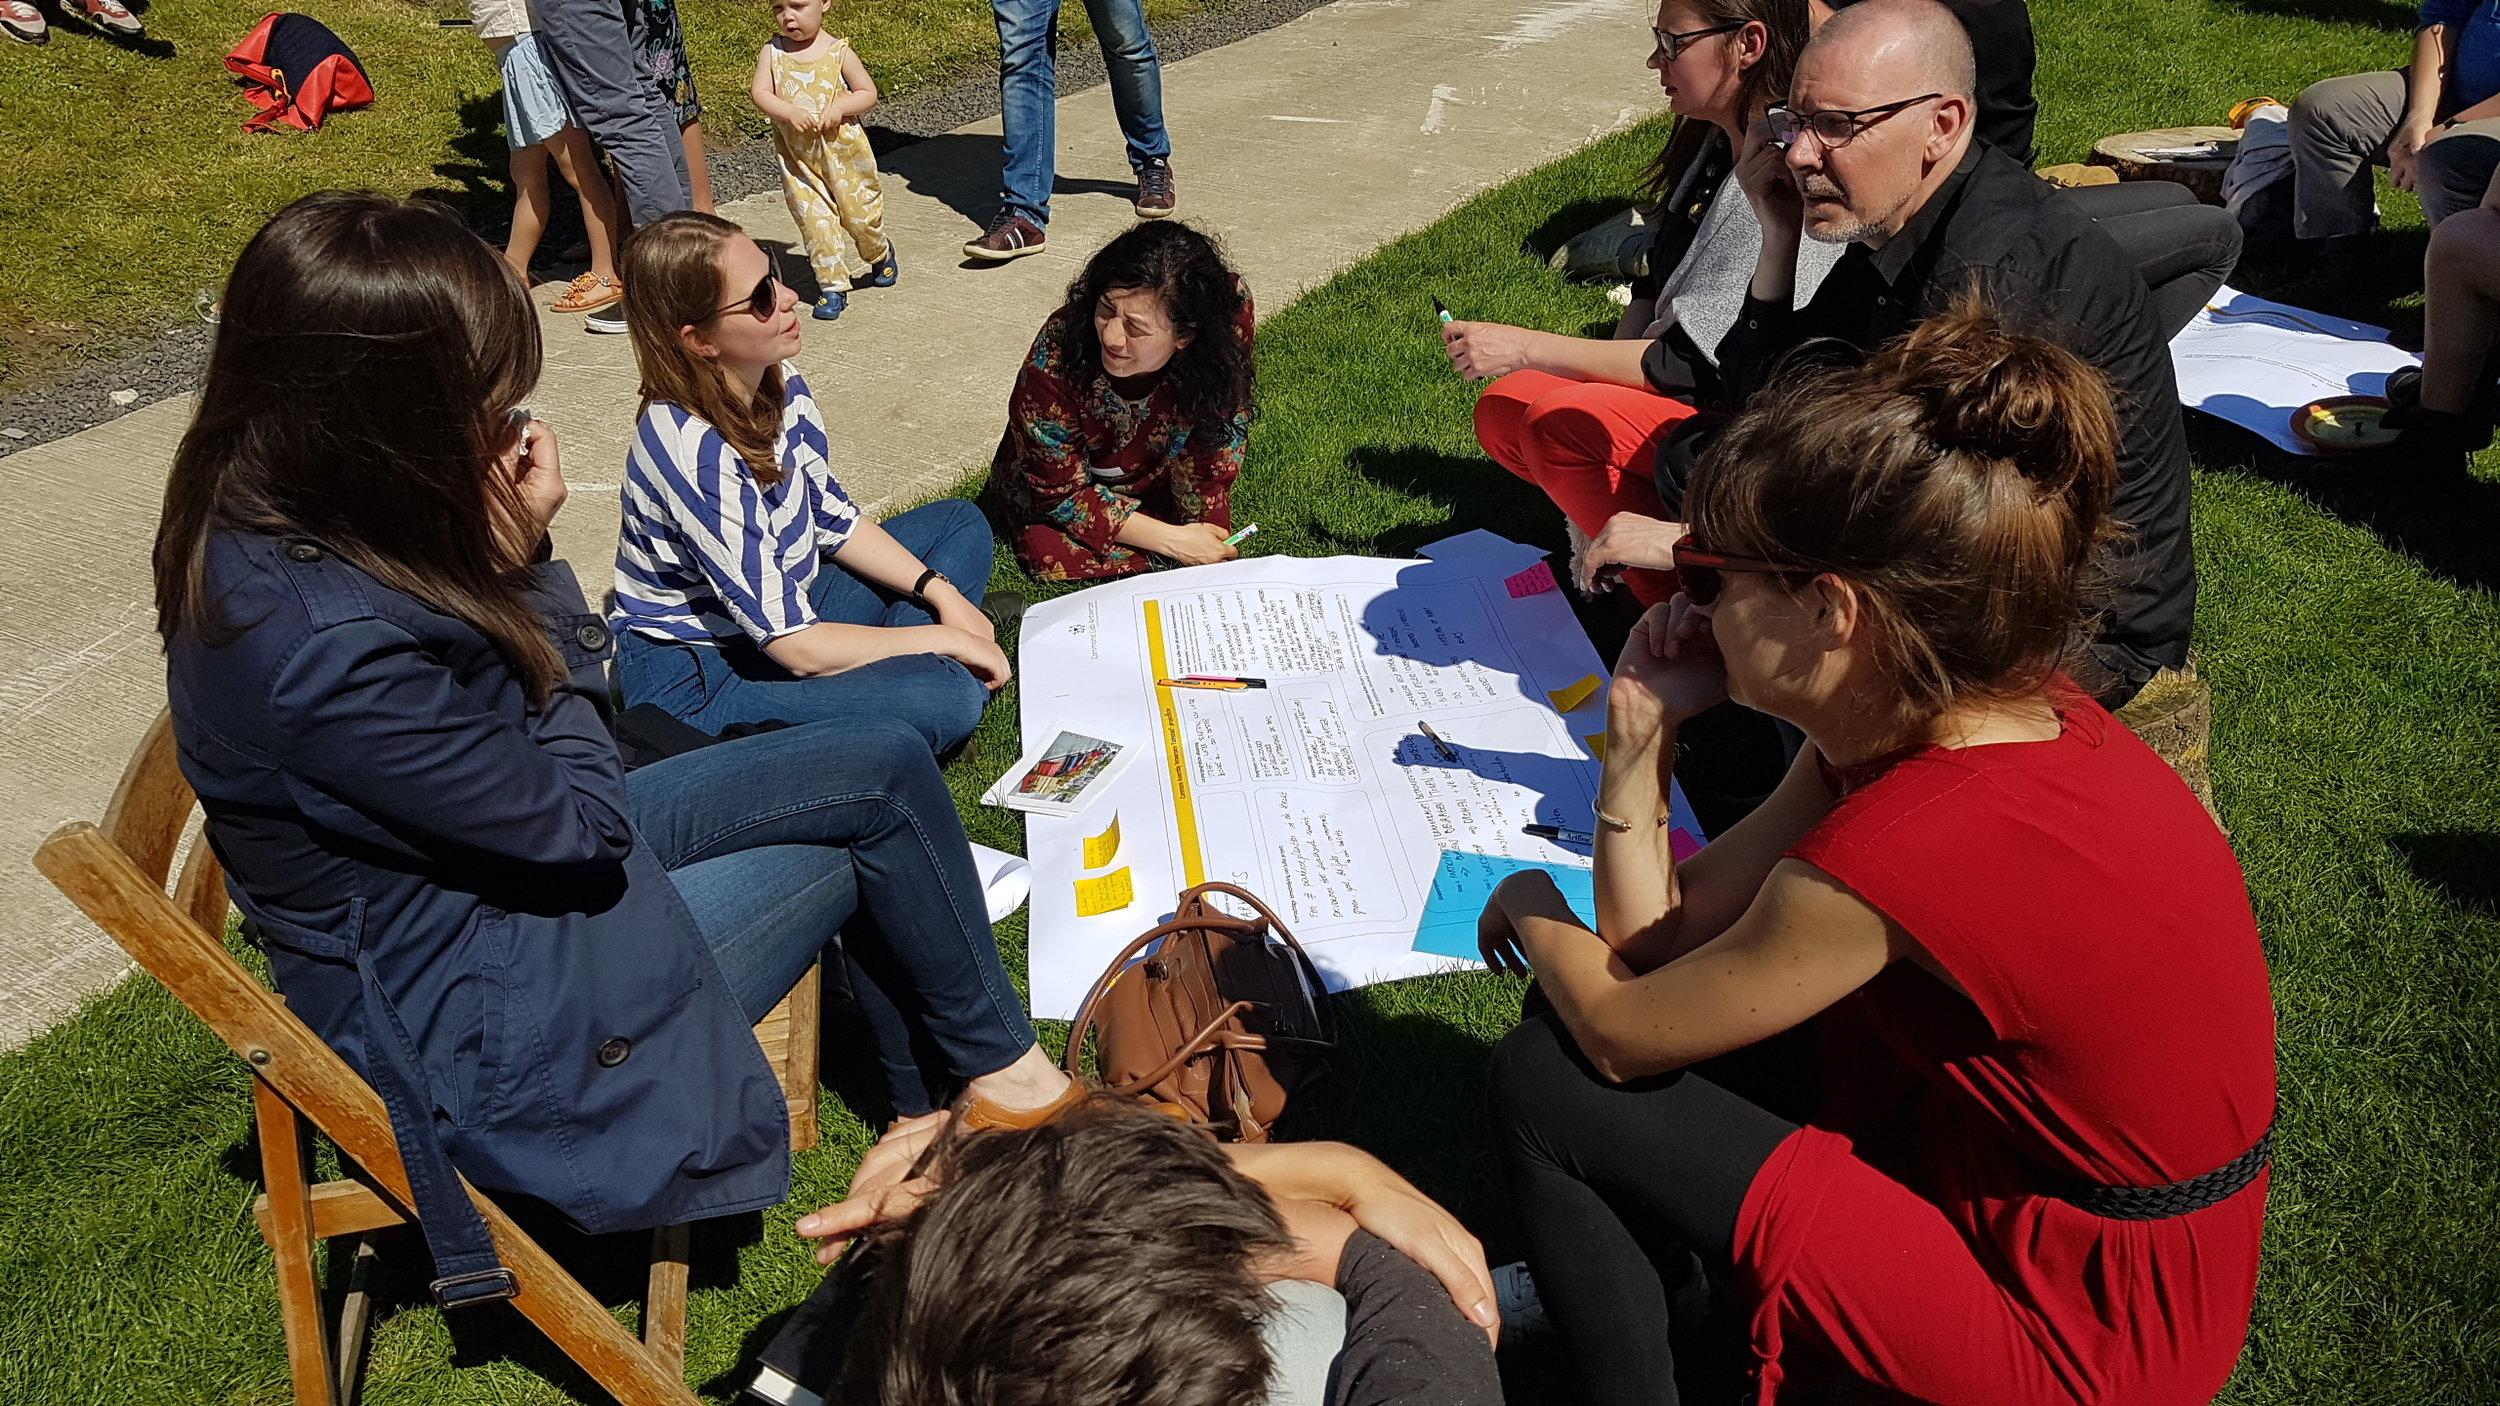 Groepsgesprek tijdens Commons Assembly 'Antwerpen Tuinstad' (5 mei 2018, de Singel)